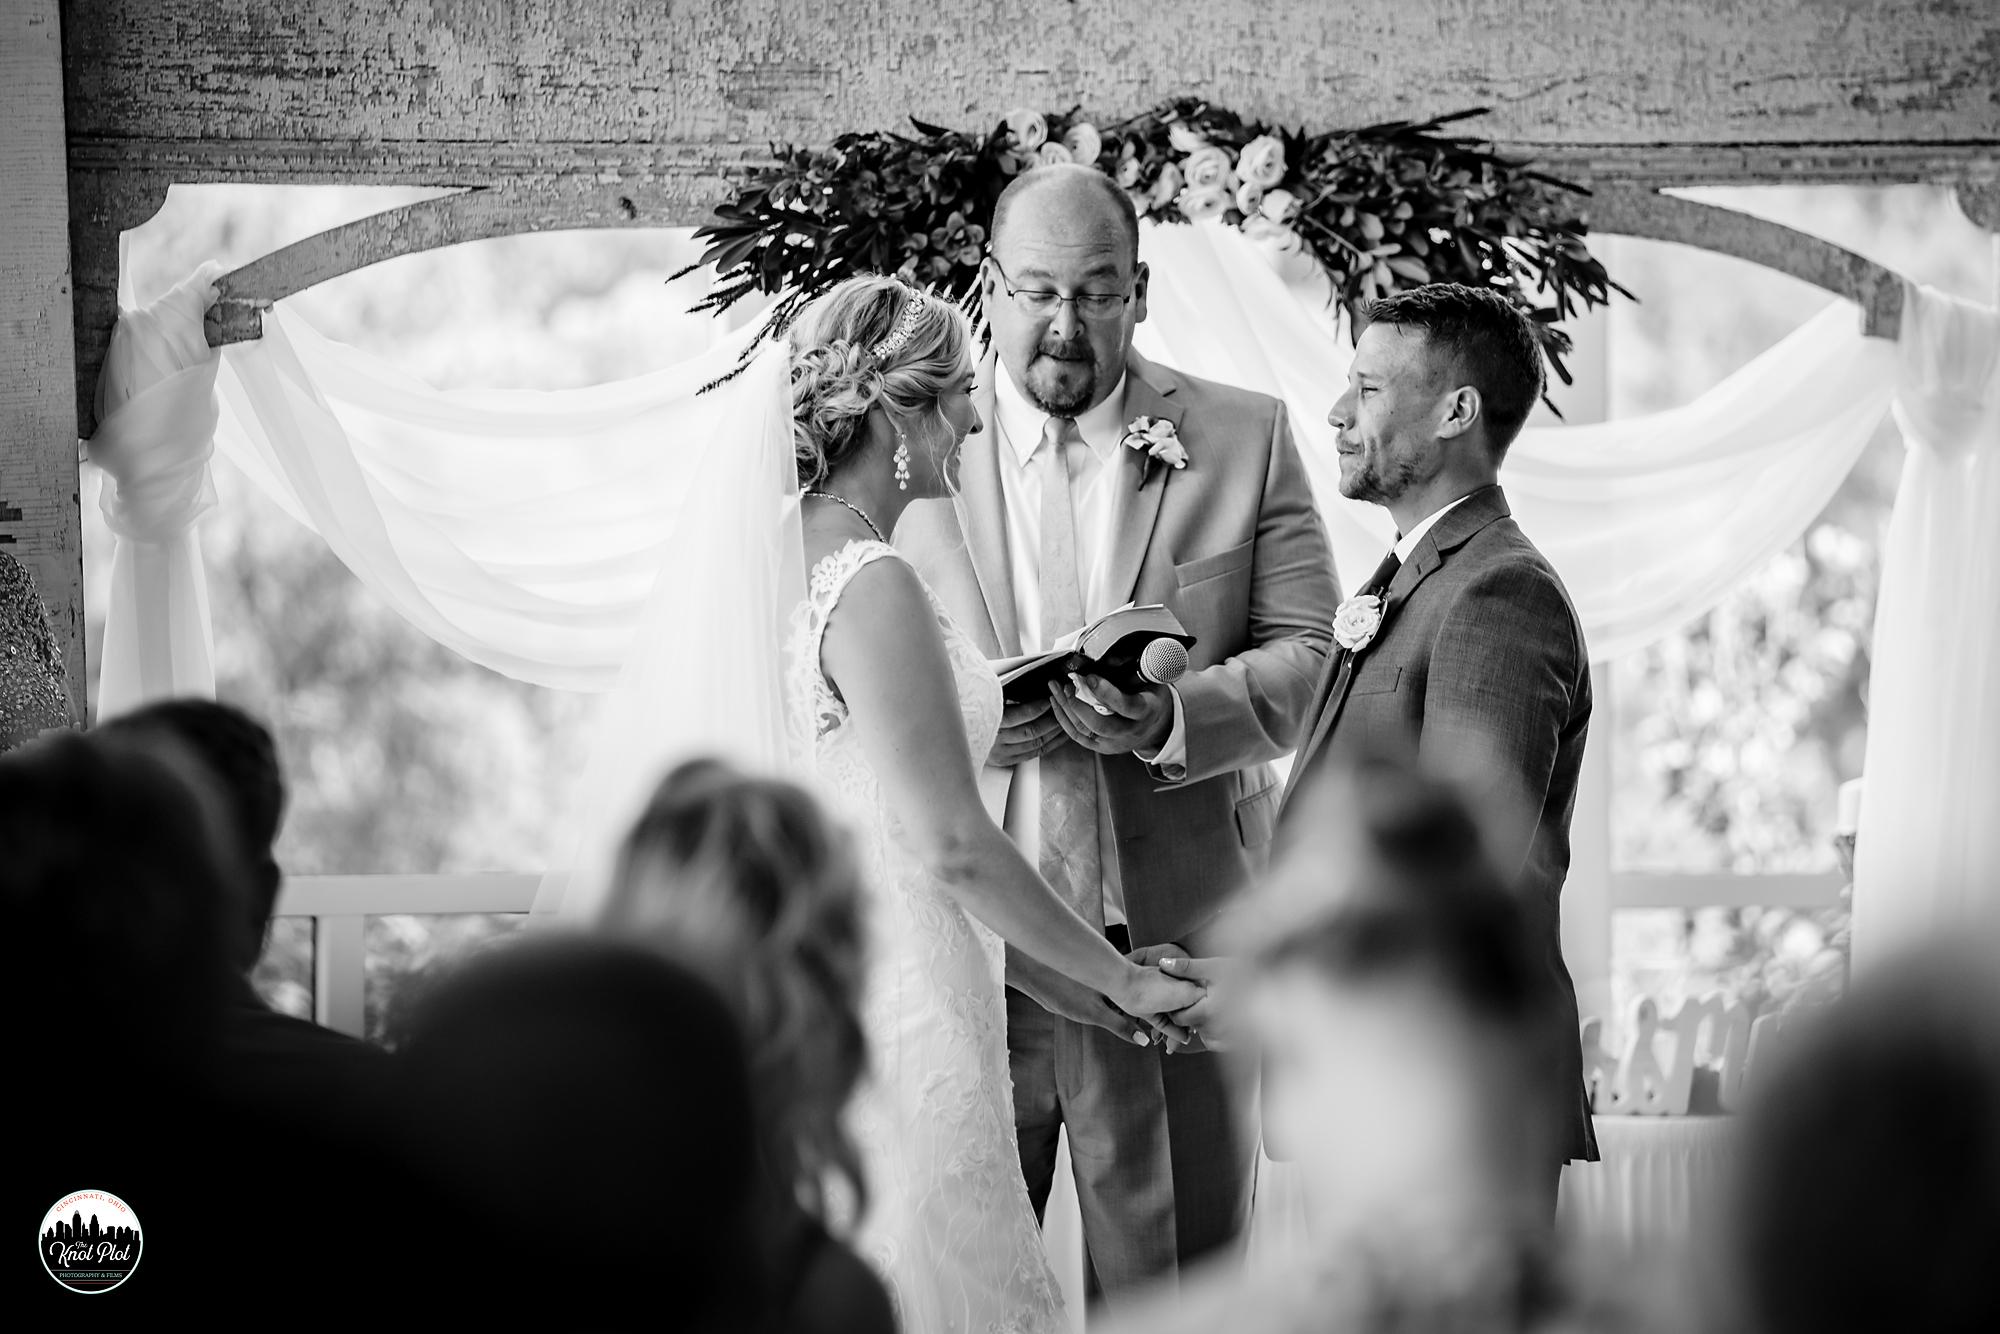 Southgate-Community-Center-KY-Wedding-Photography-12.jpg